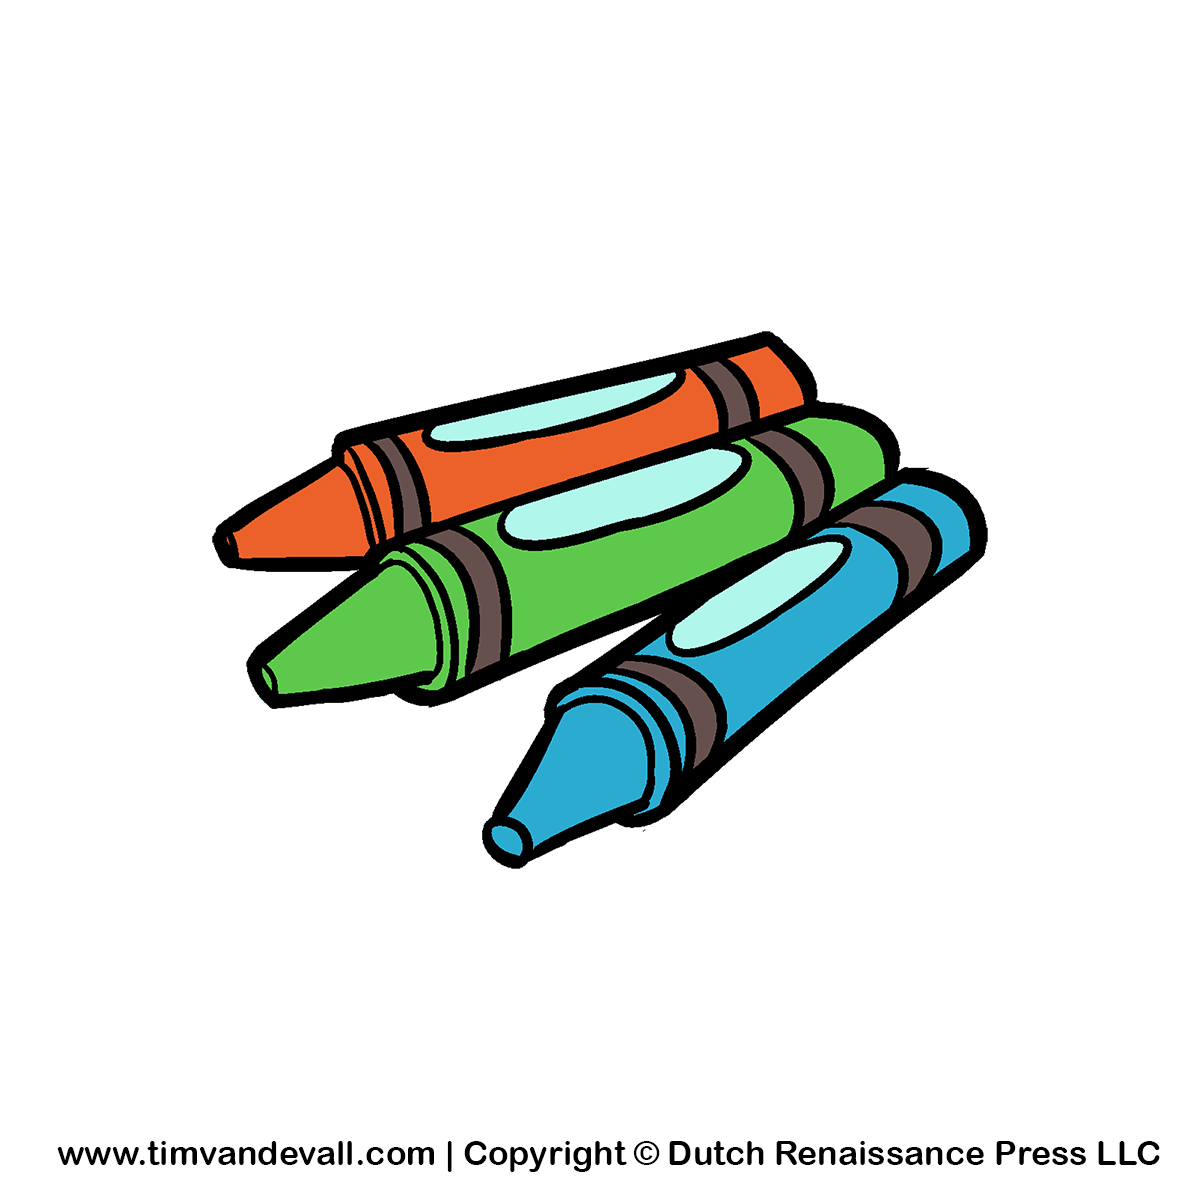 Crayon clipart 2 crayon. Of crayons cartoon gclipart